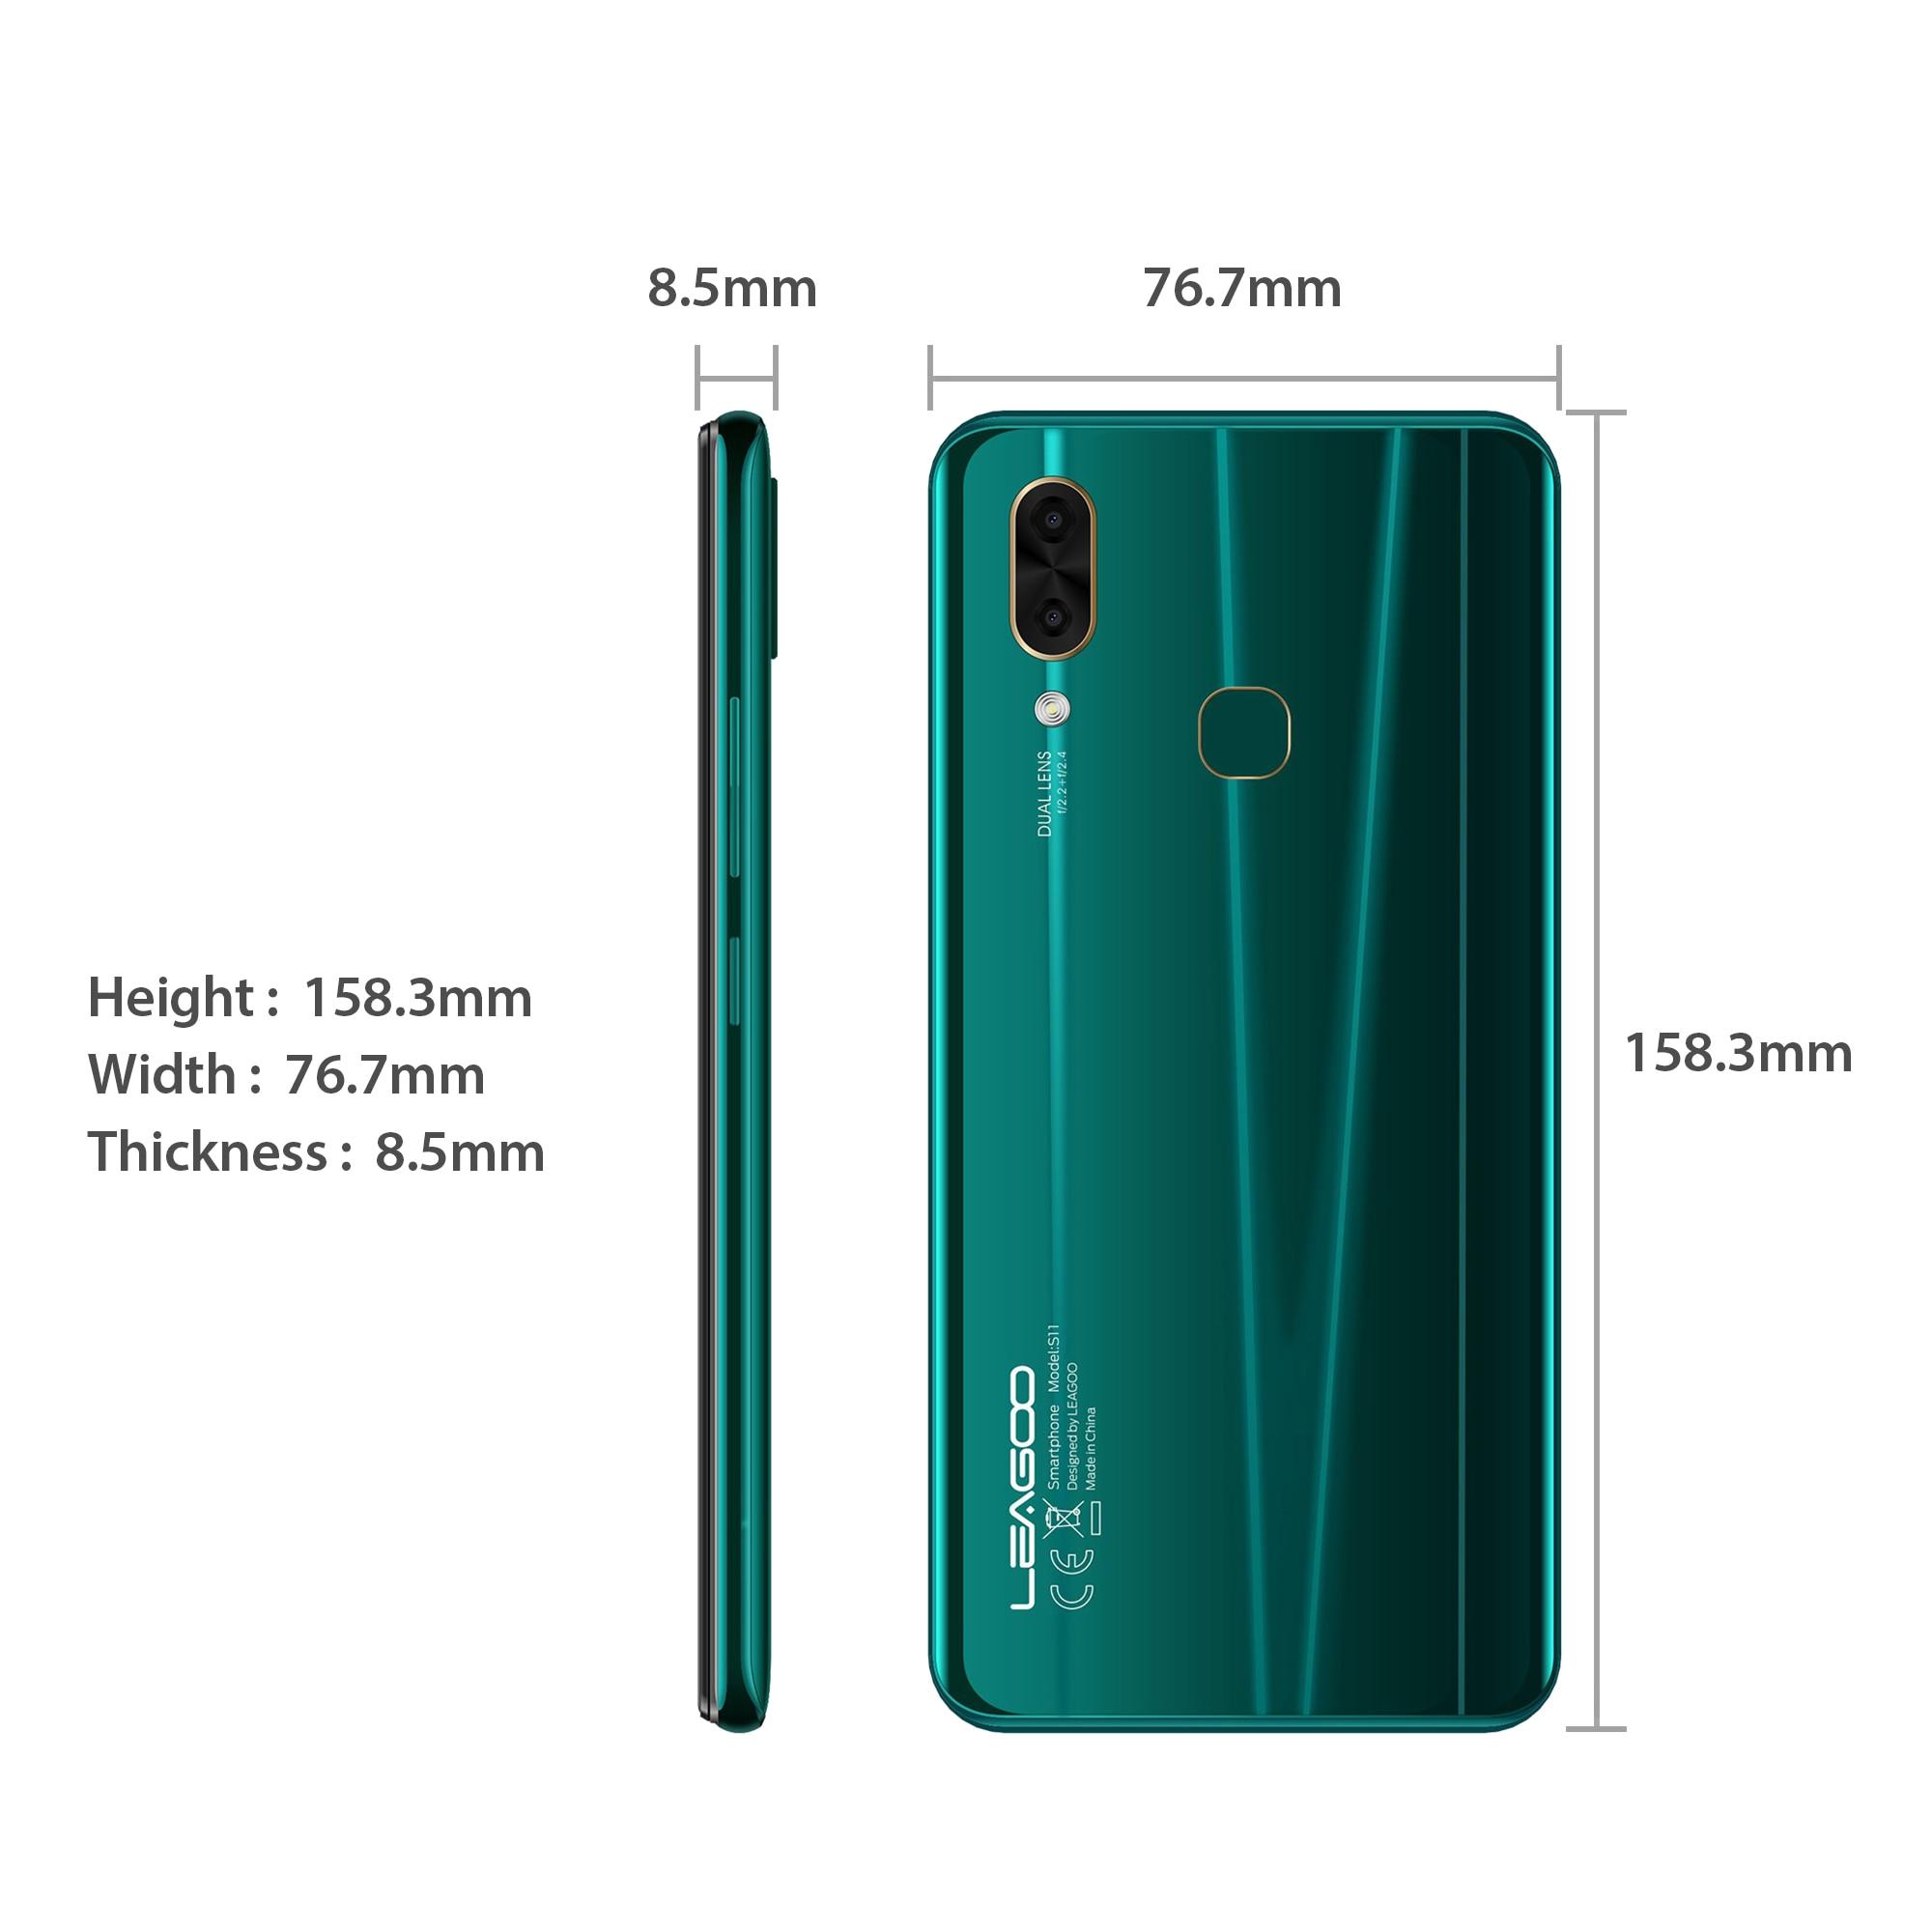 LEAGOO S11 Refurbished LG Phone With Water Drop Display And 13MP Dual Camera